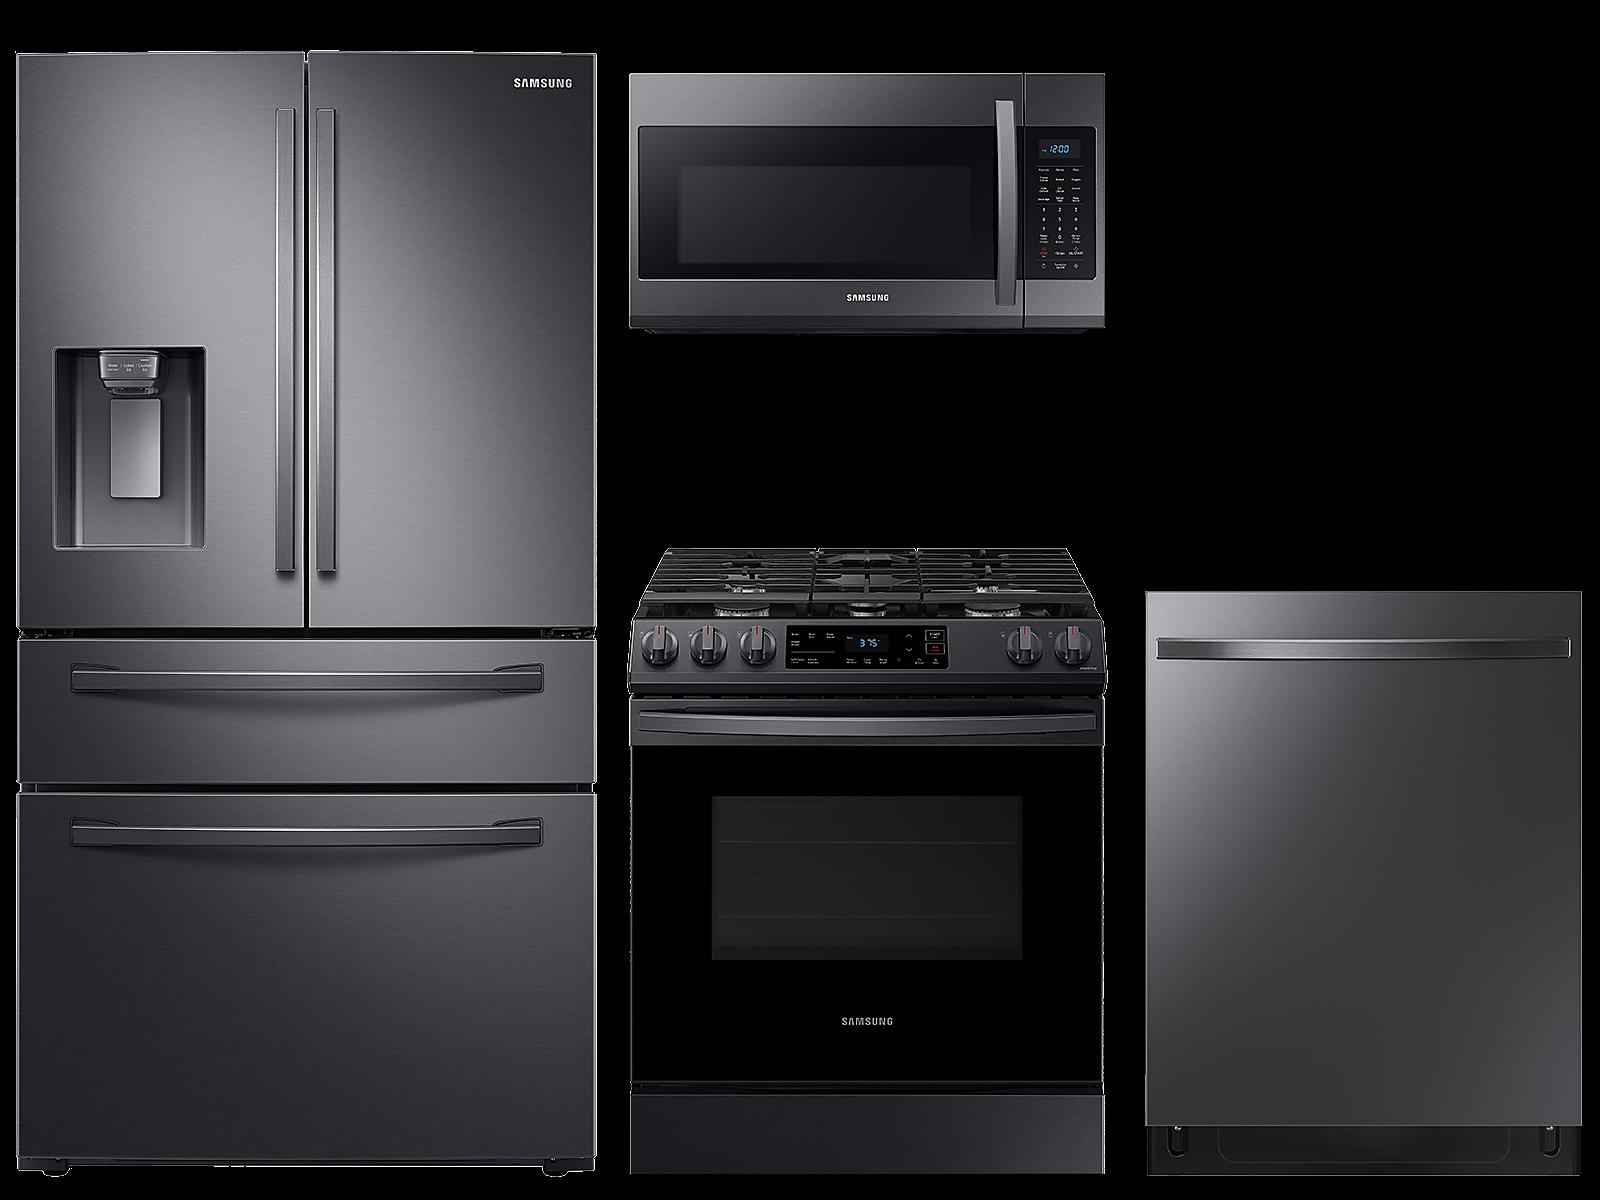 Samsung coupon: Samsung 23 cu. ft. counter depth 4-door refrigerator, gas range, microwave and 48 dBA modern-look dishwasher package(BNDL-1614028389122)